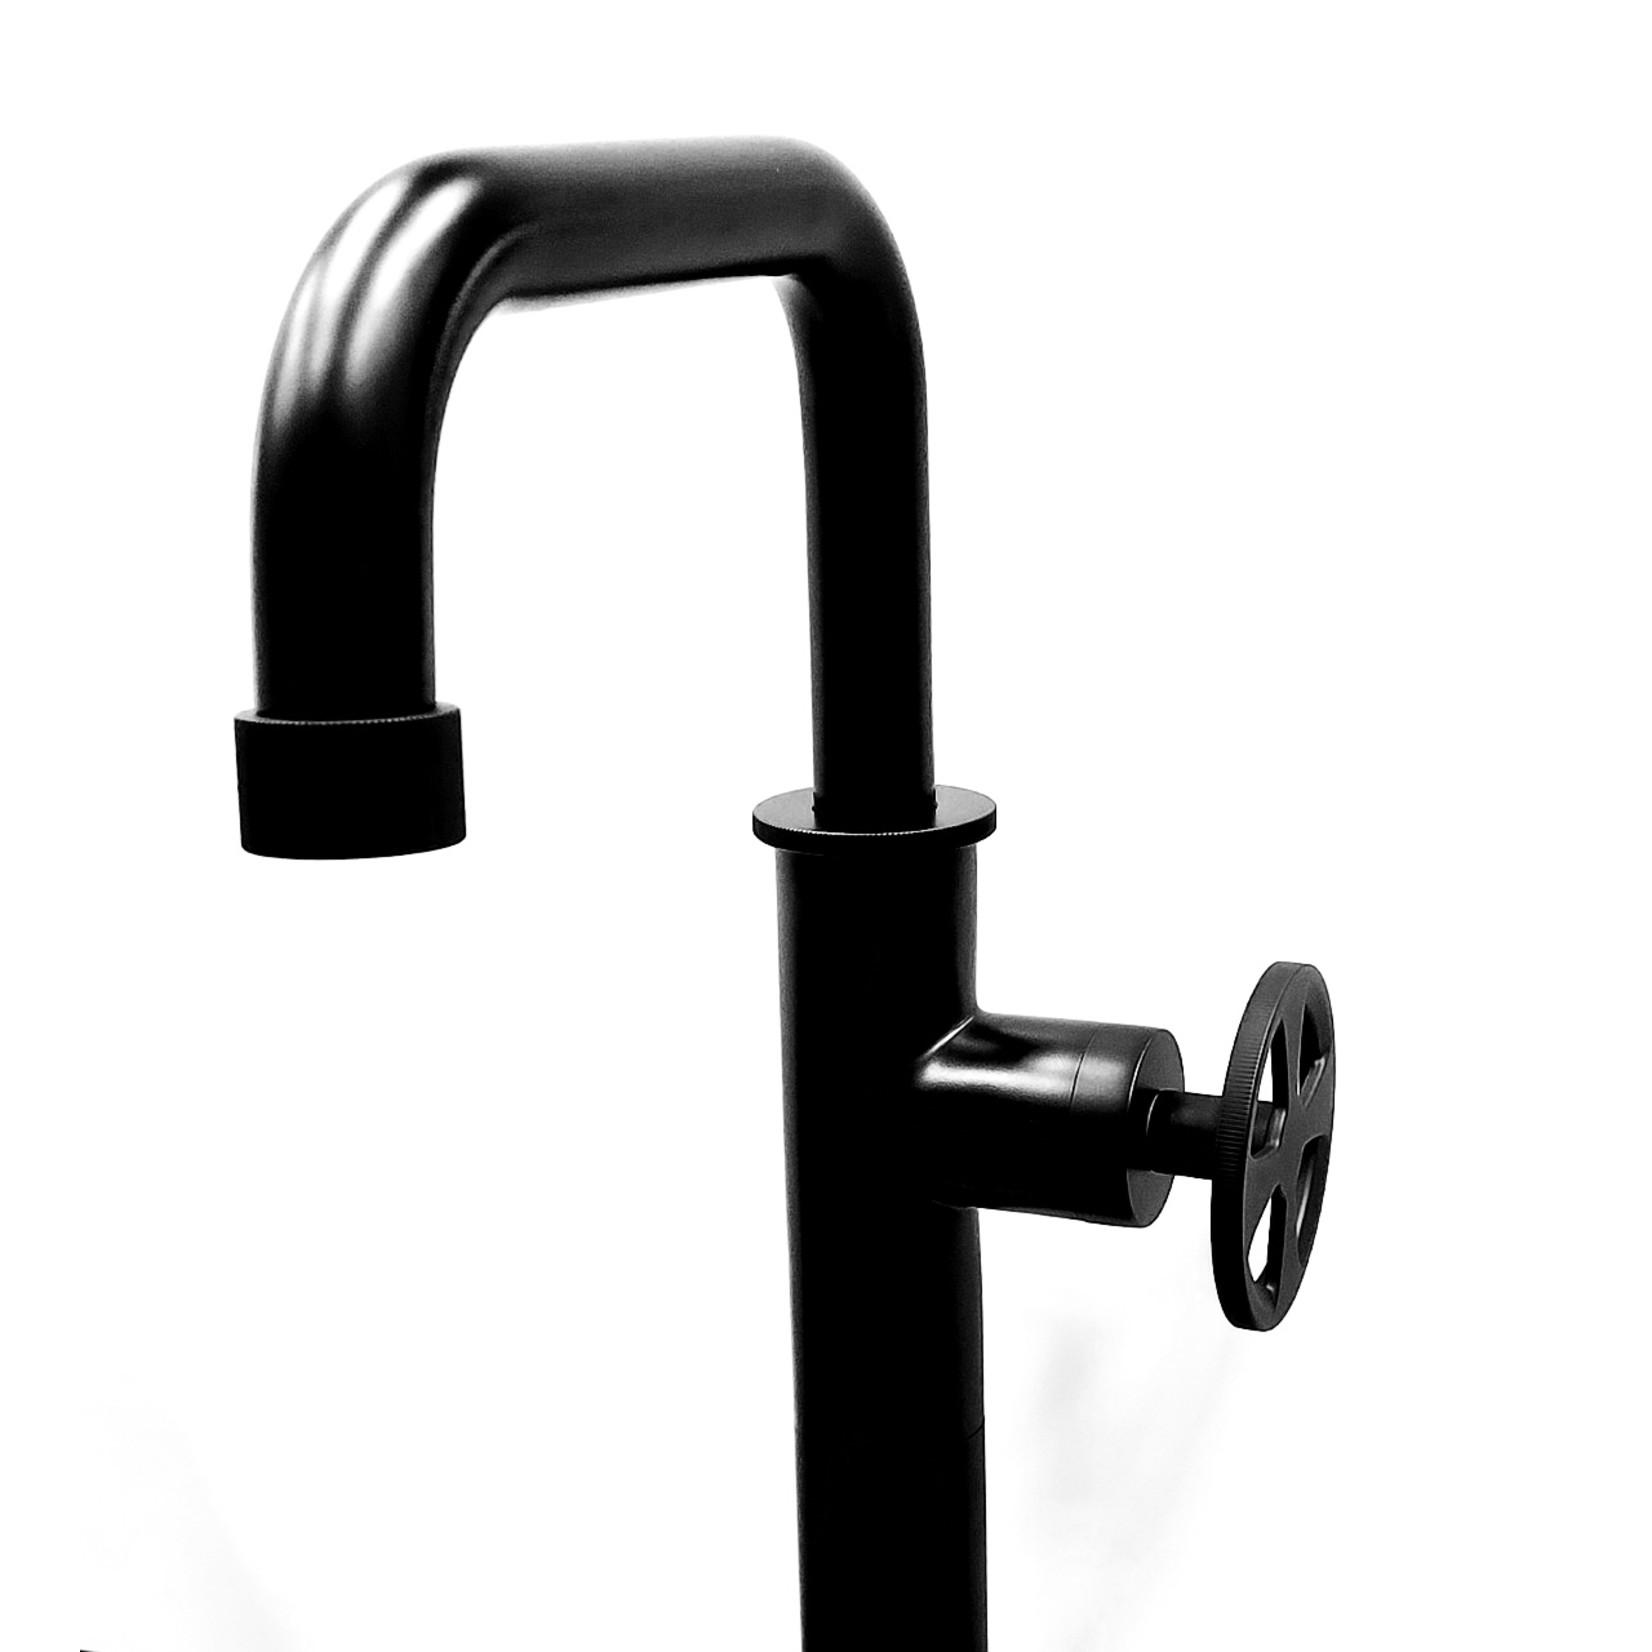 Matte black lavatory faucet NRD-89-1102-MB